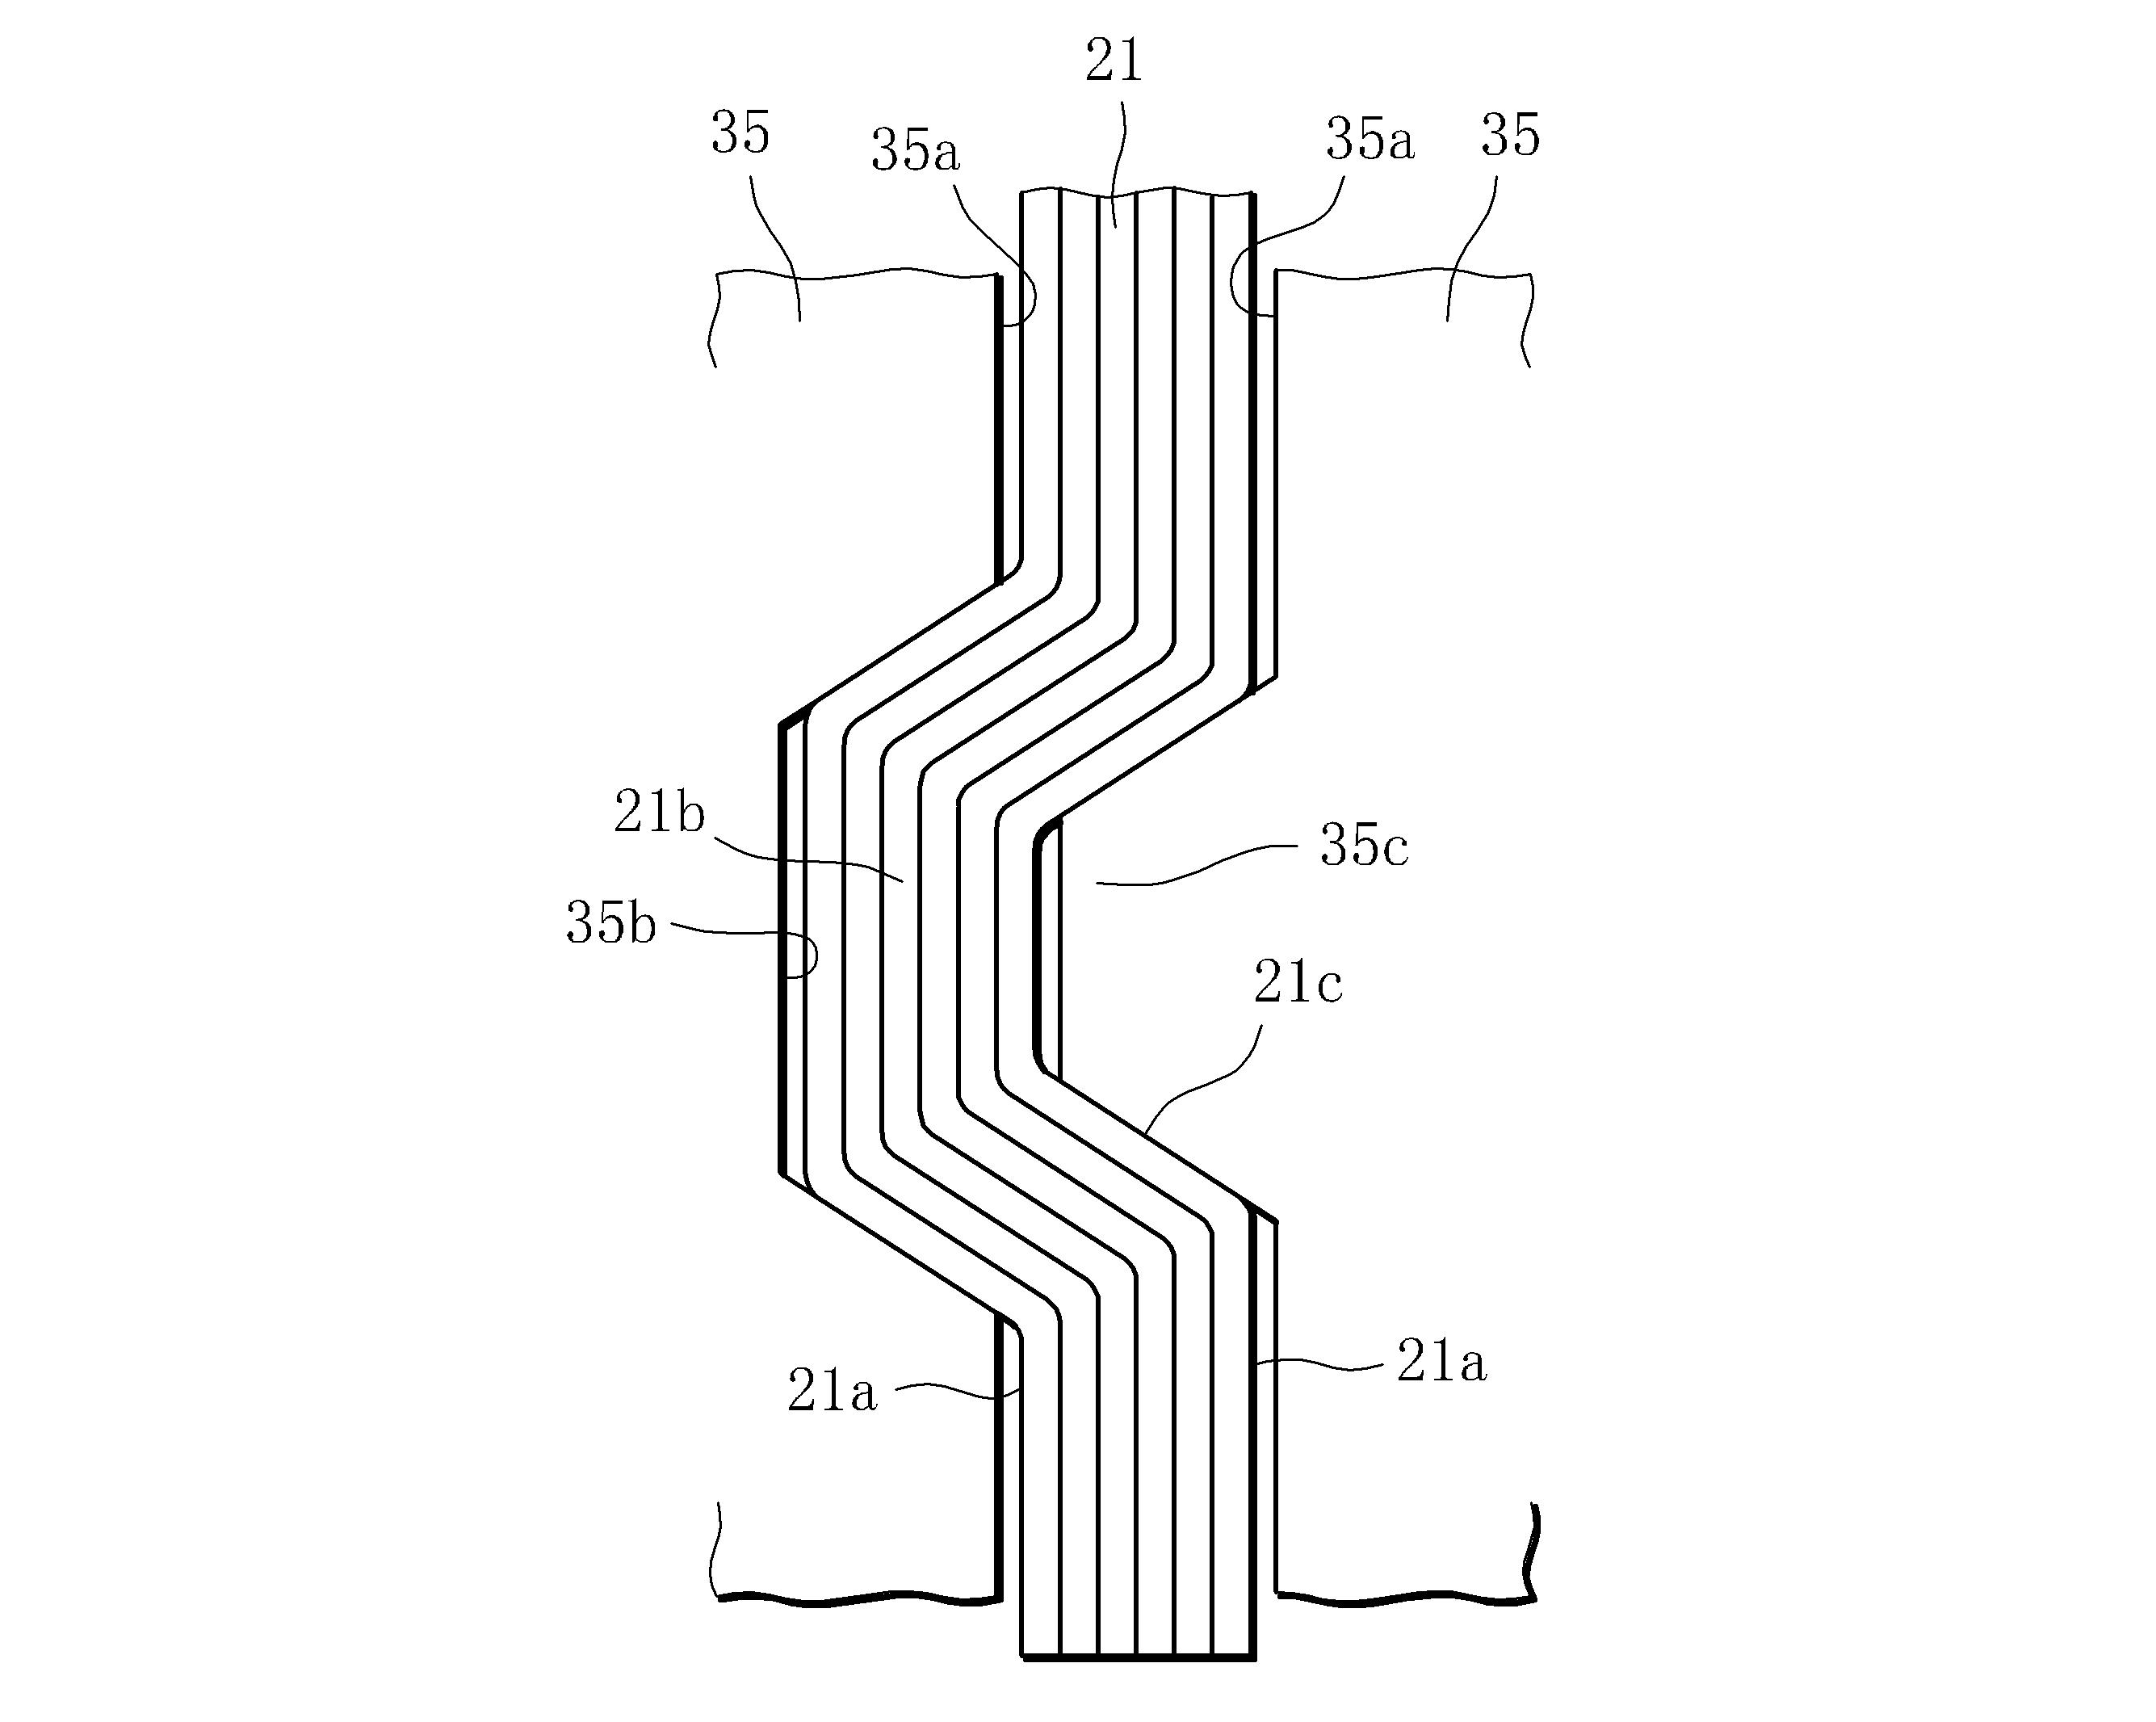 WO2013191195A1 - 翼の連結部構造及びこれを用いたジェットエンジン         - Google PatentsFamily